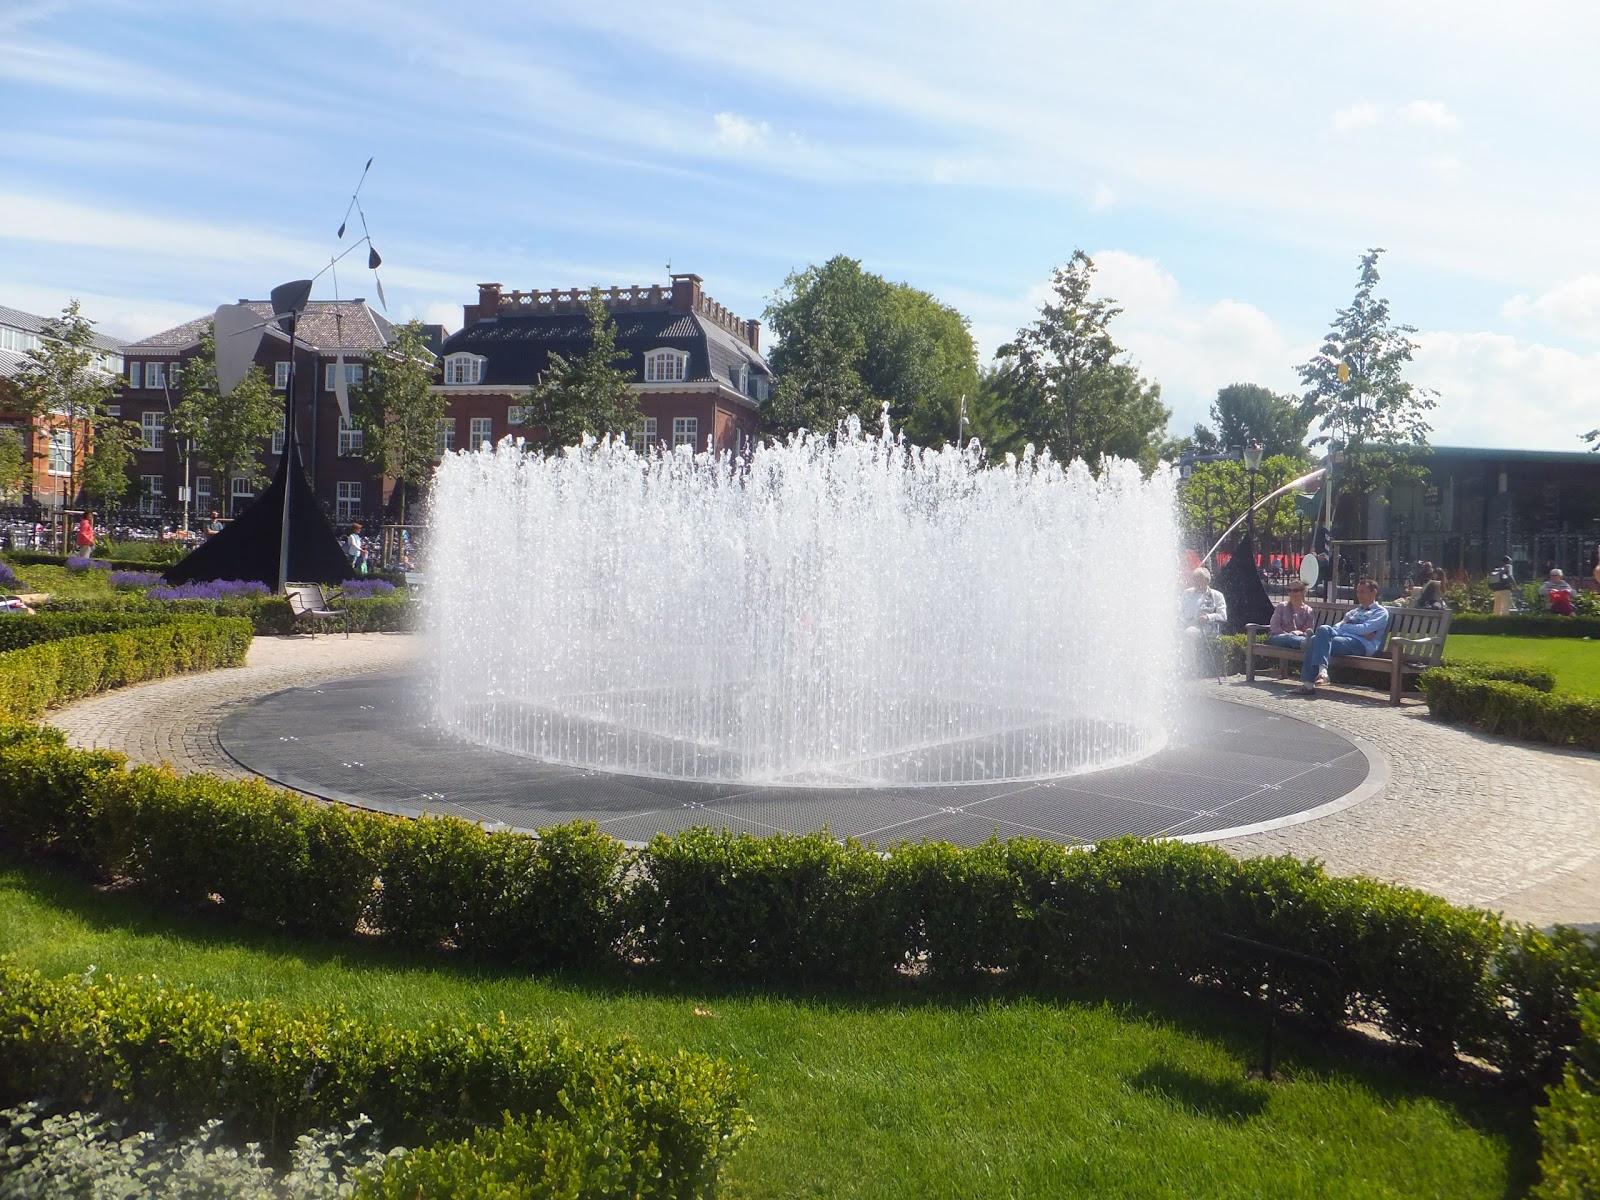 Viaje a Amsterdam, Holanda, RijksMuseum, Países Bajos, Elisa N, Blog de Viajes, Lifestyle, Travel